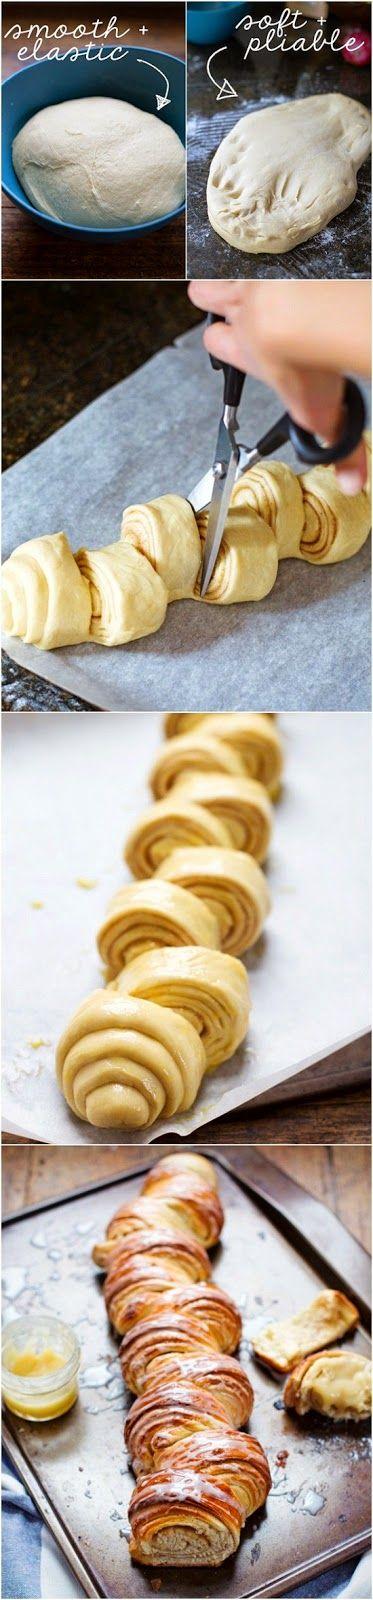 Homemade Cinnamon Roll Pull Apart Bread